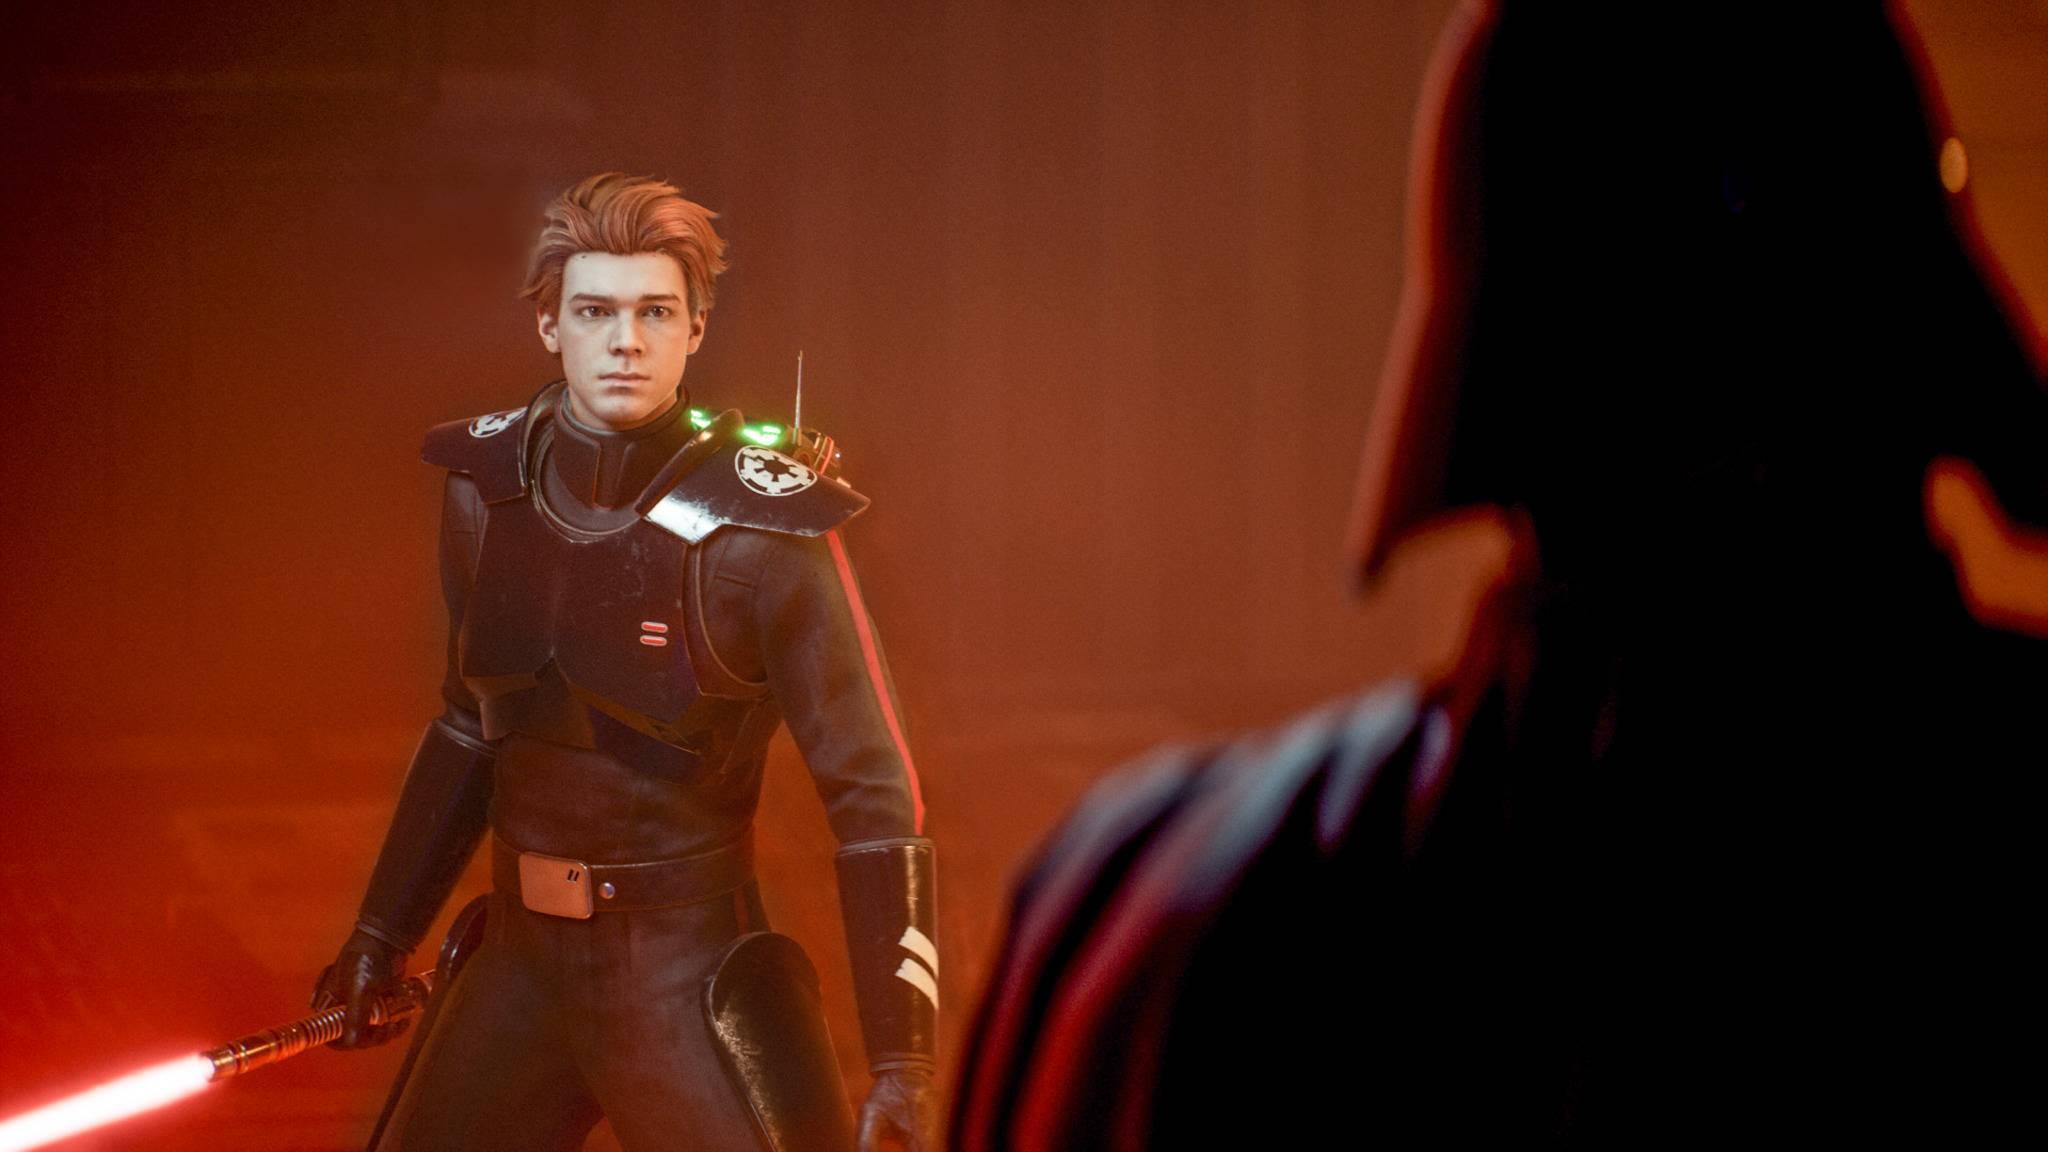 star-wars-jedi-fallen-order-may-4th-update-inquisitor-uniform